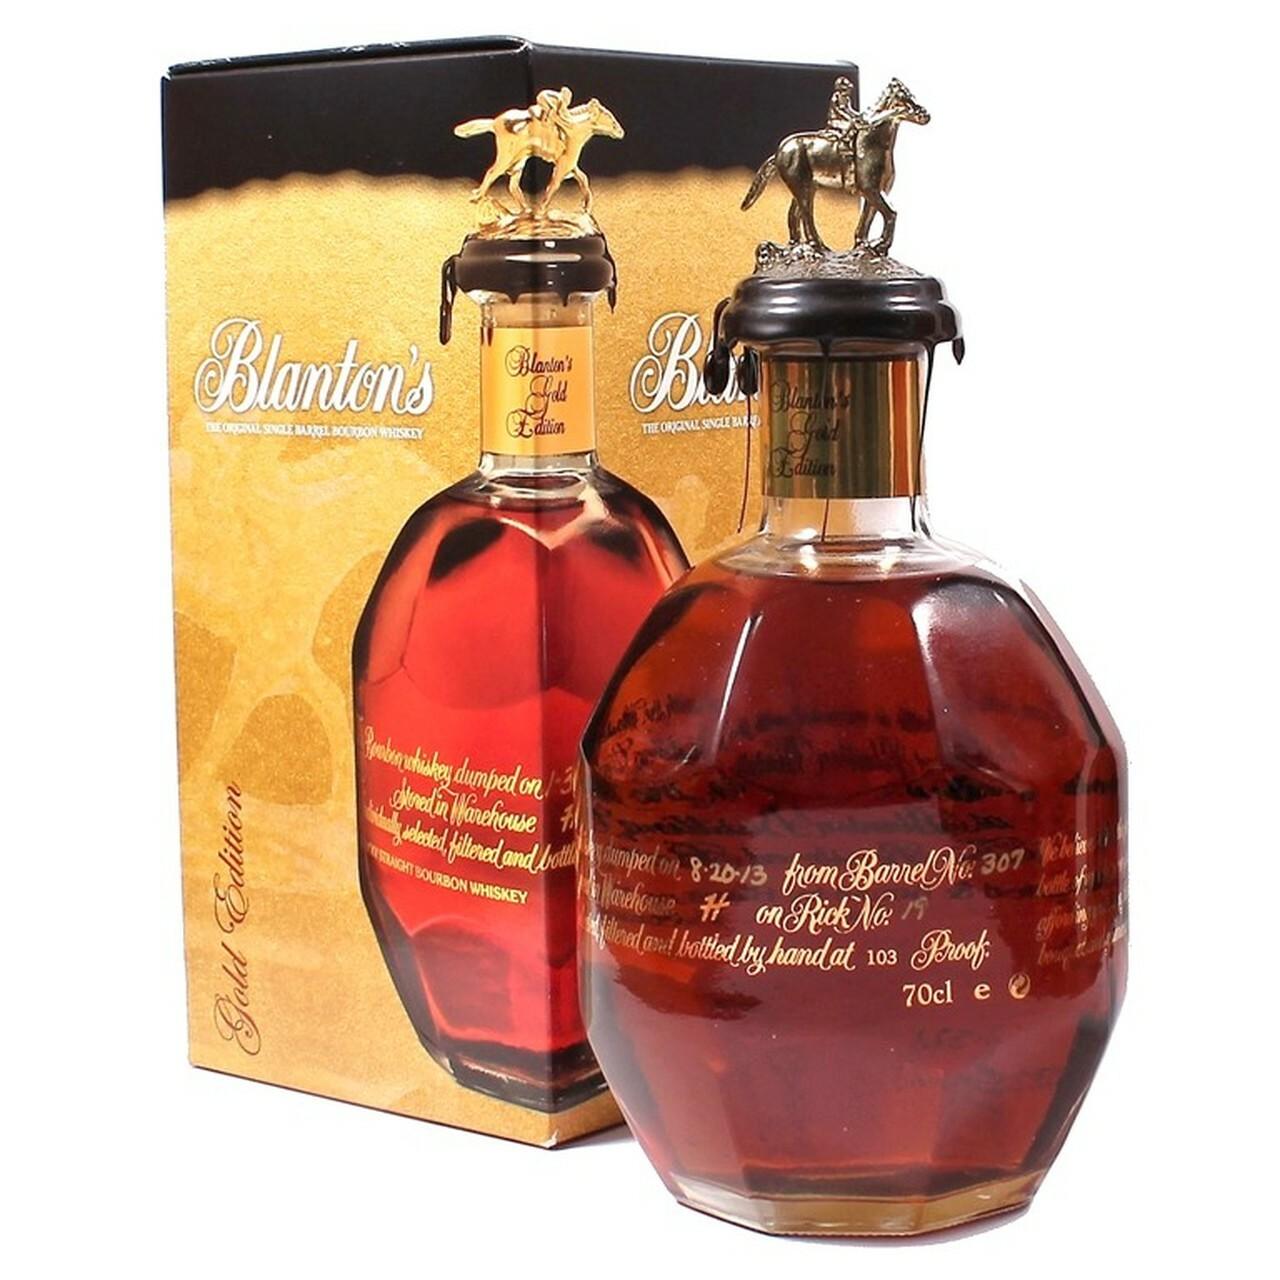 A bottle of Blanton's Gold